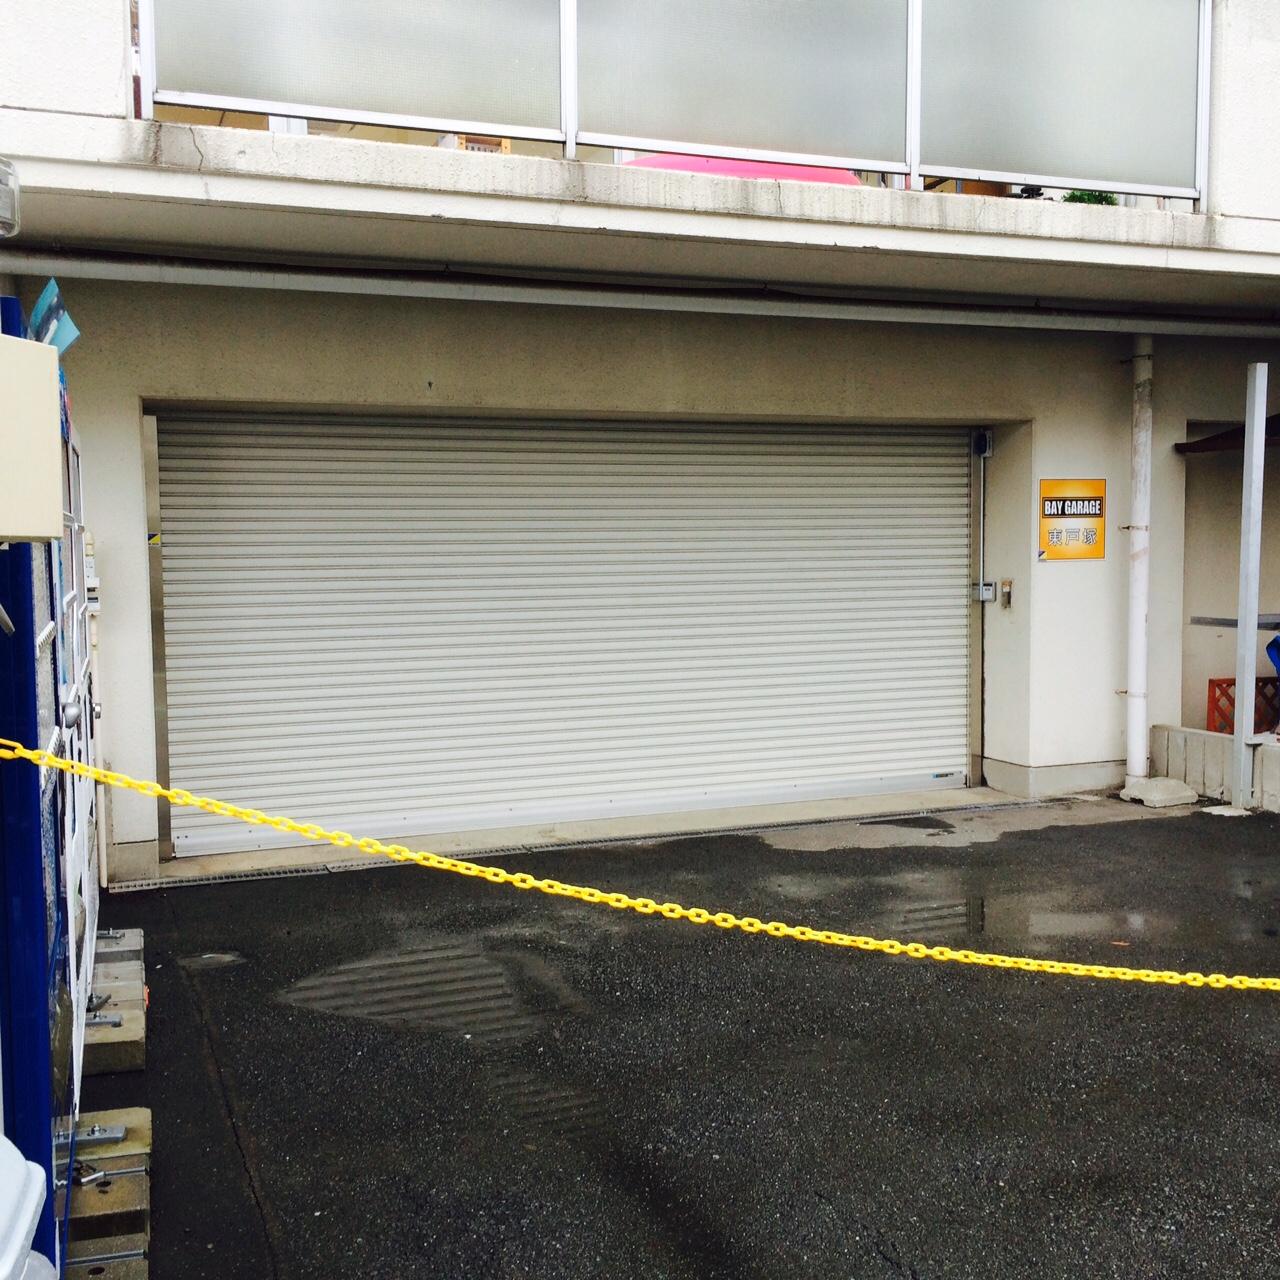 BAY GARAGE 東戸塚の物件外観